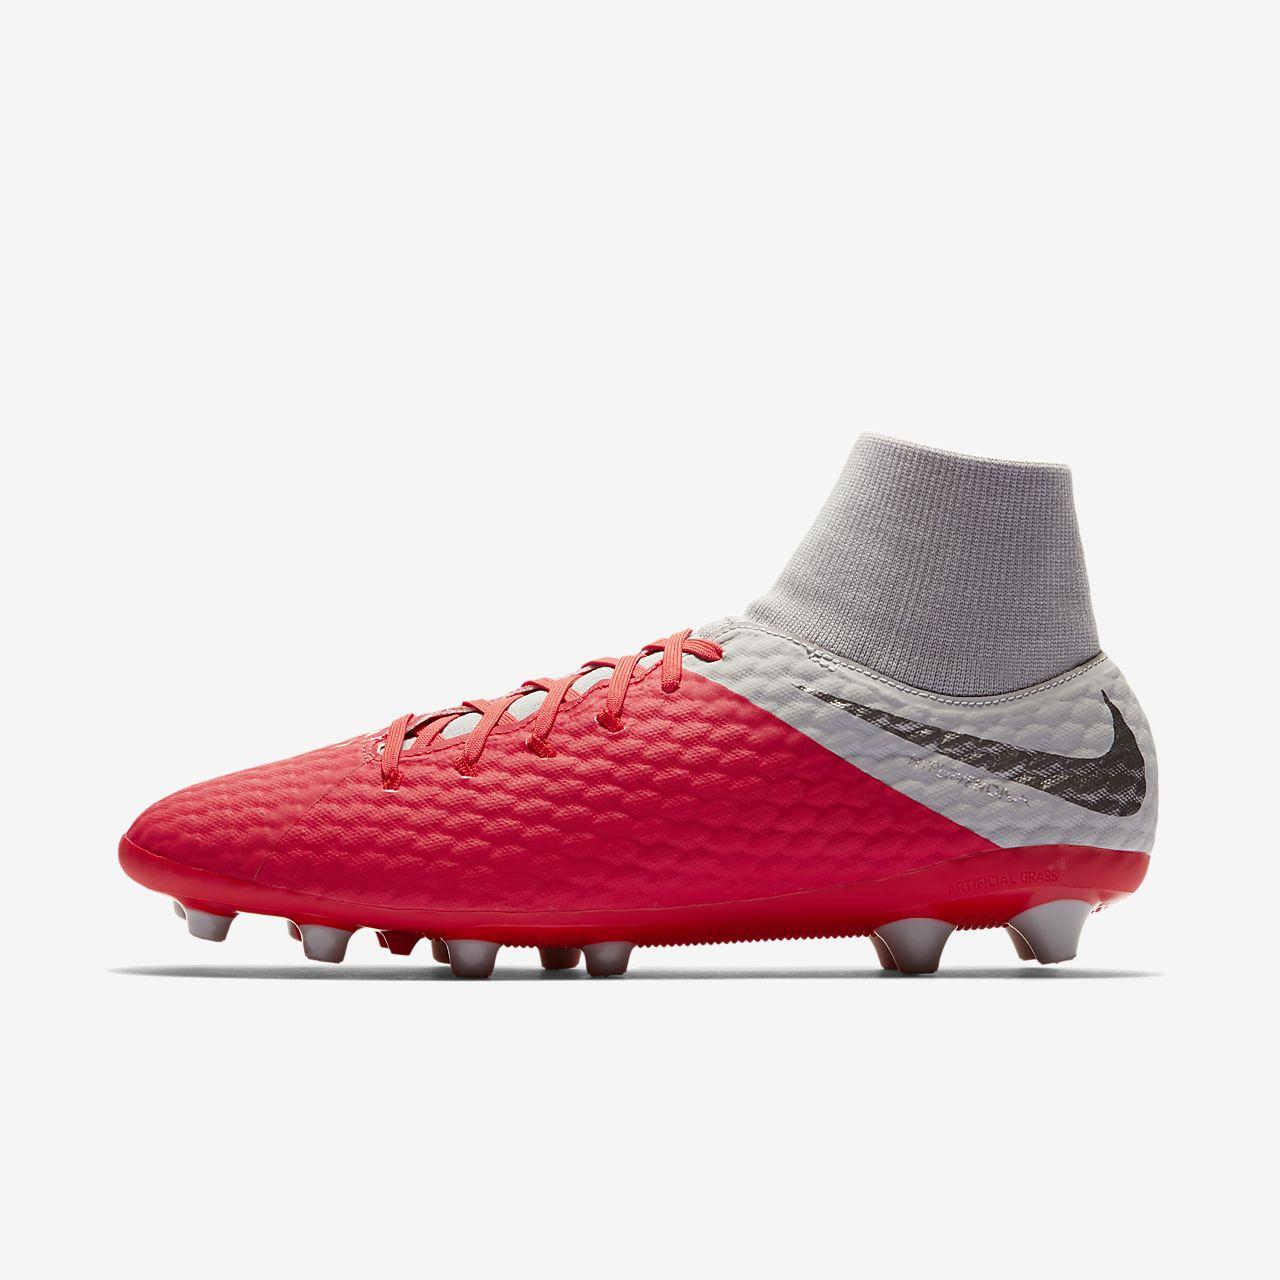 4c9cb565f5 ... Nike Hypervenom III Academy Dynamic Fit AG-PRO Artificial-Grass  Football Boot